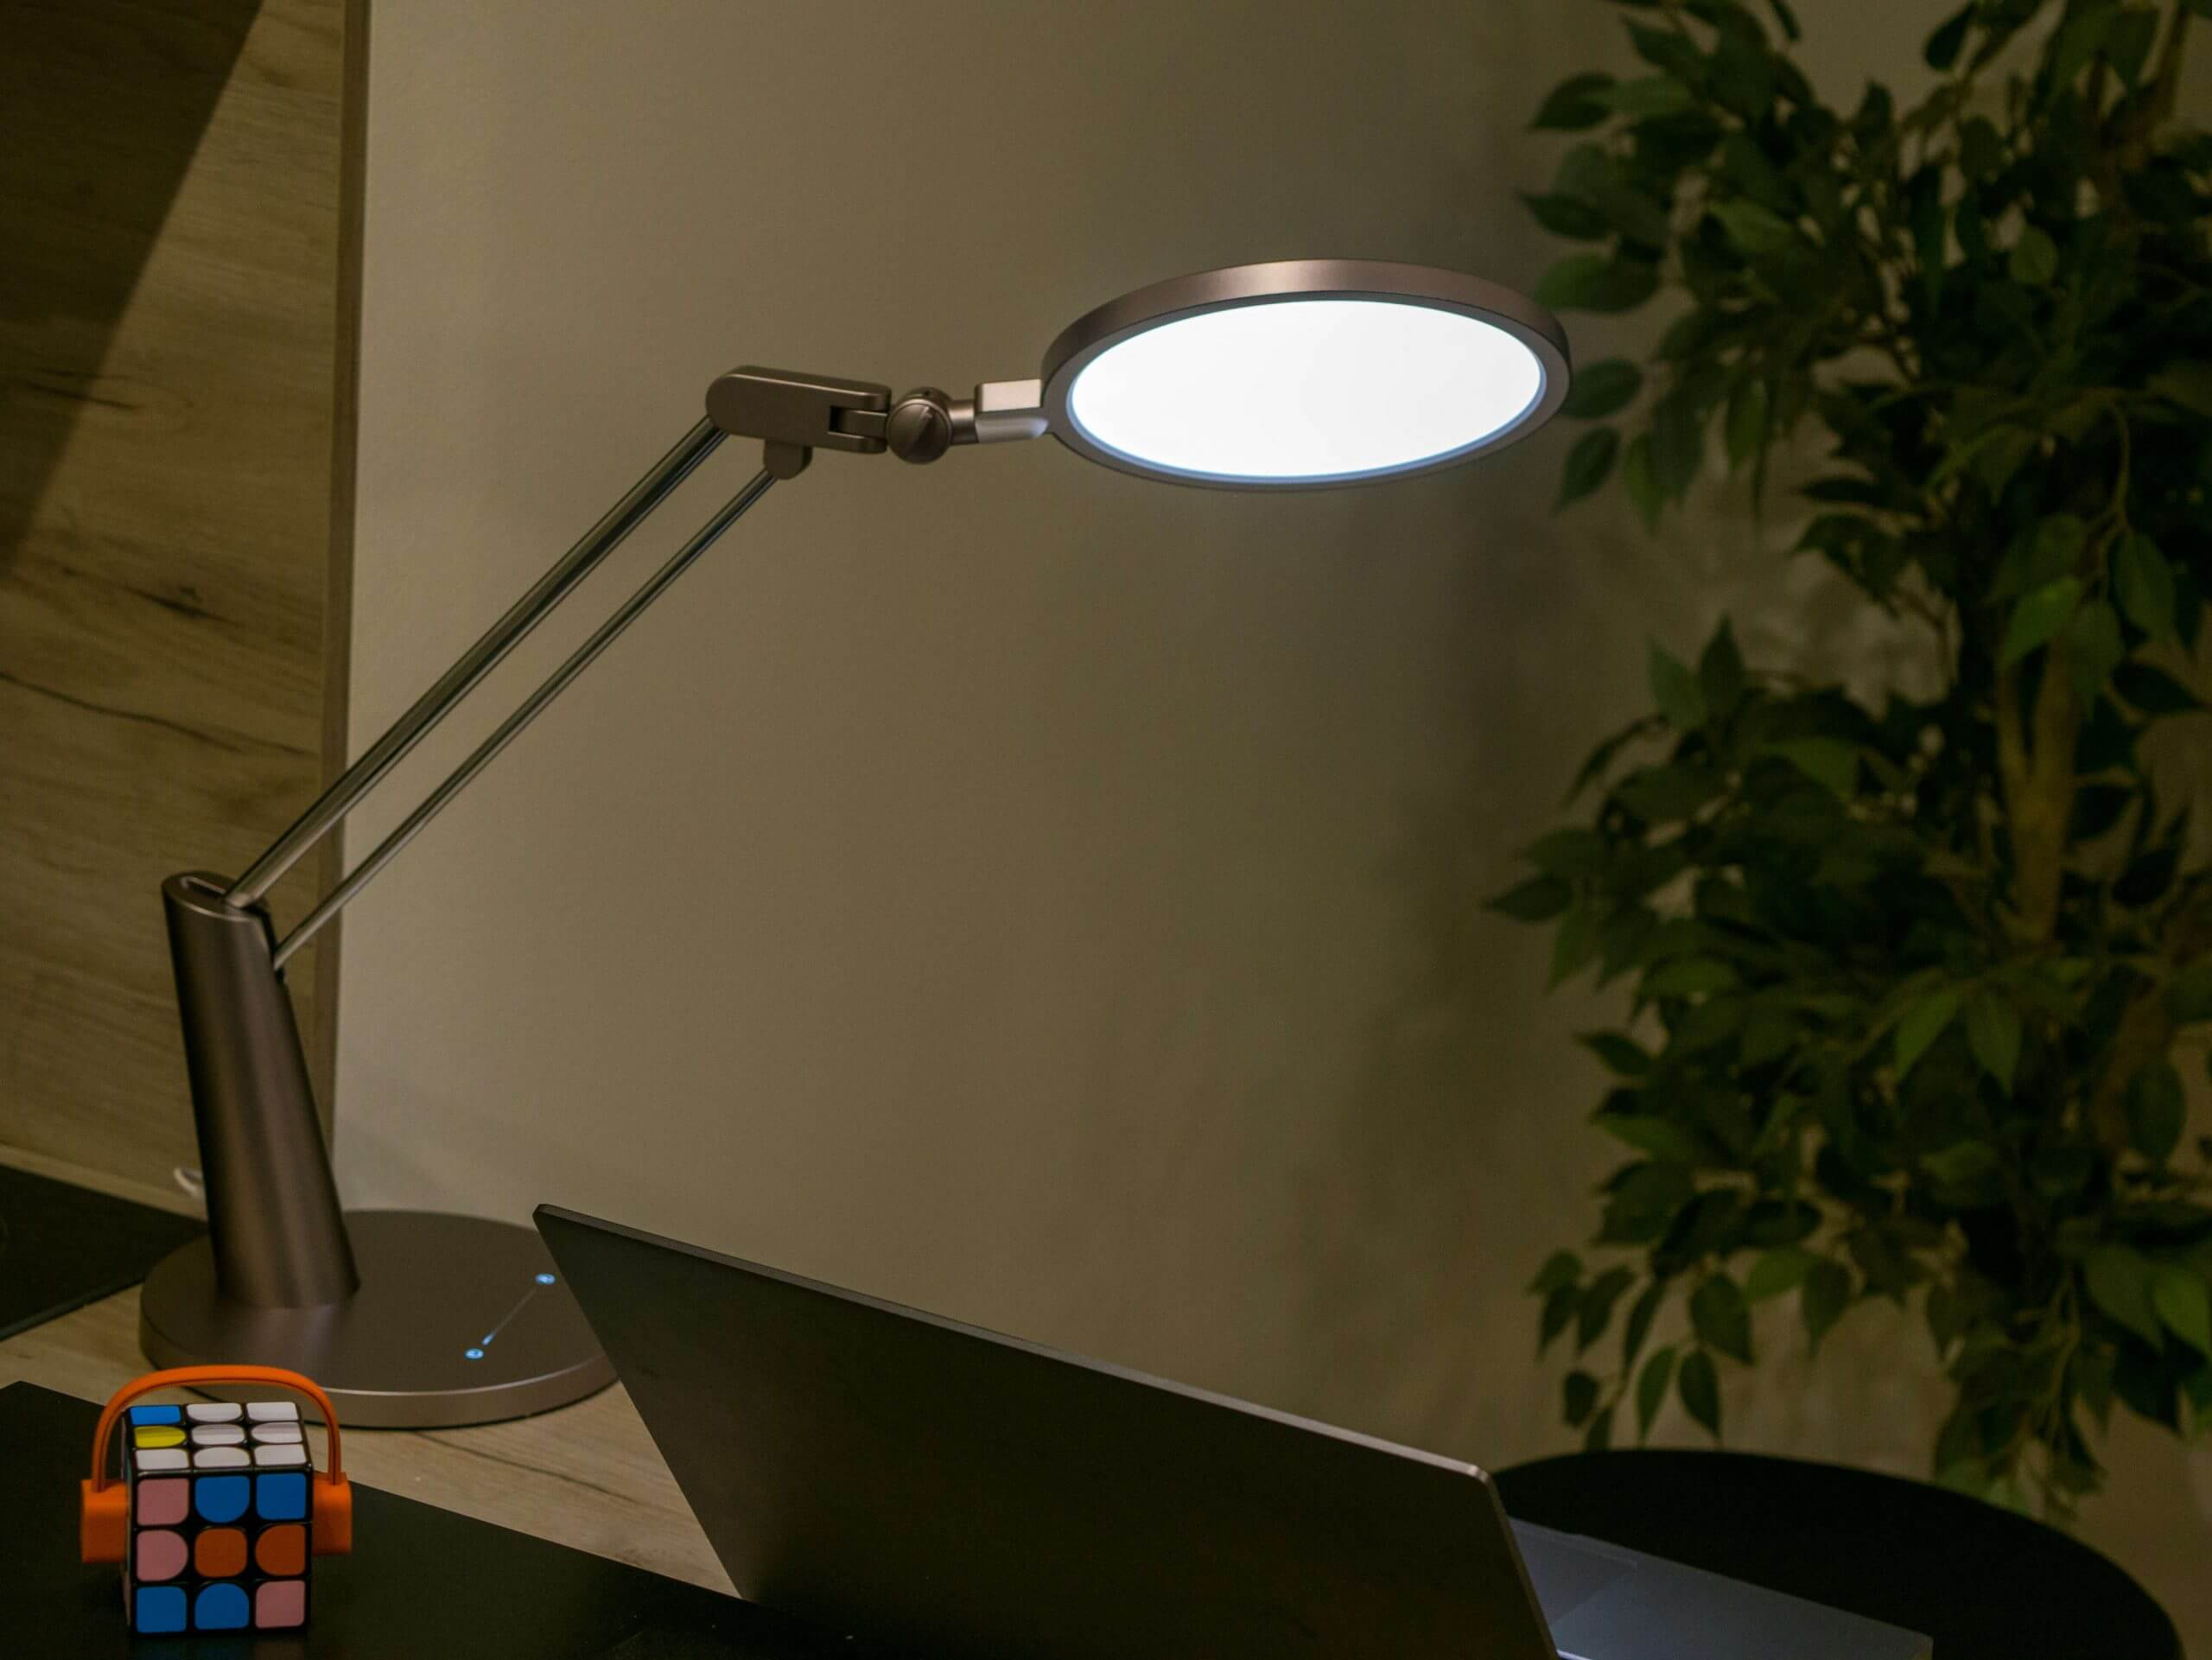 Yeelight Serene Desk Pro